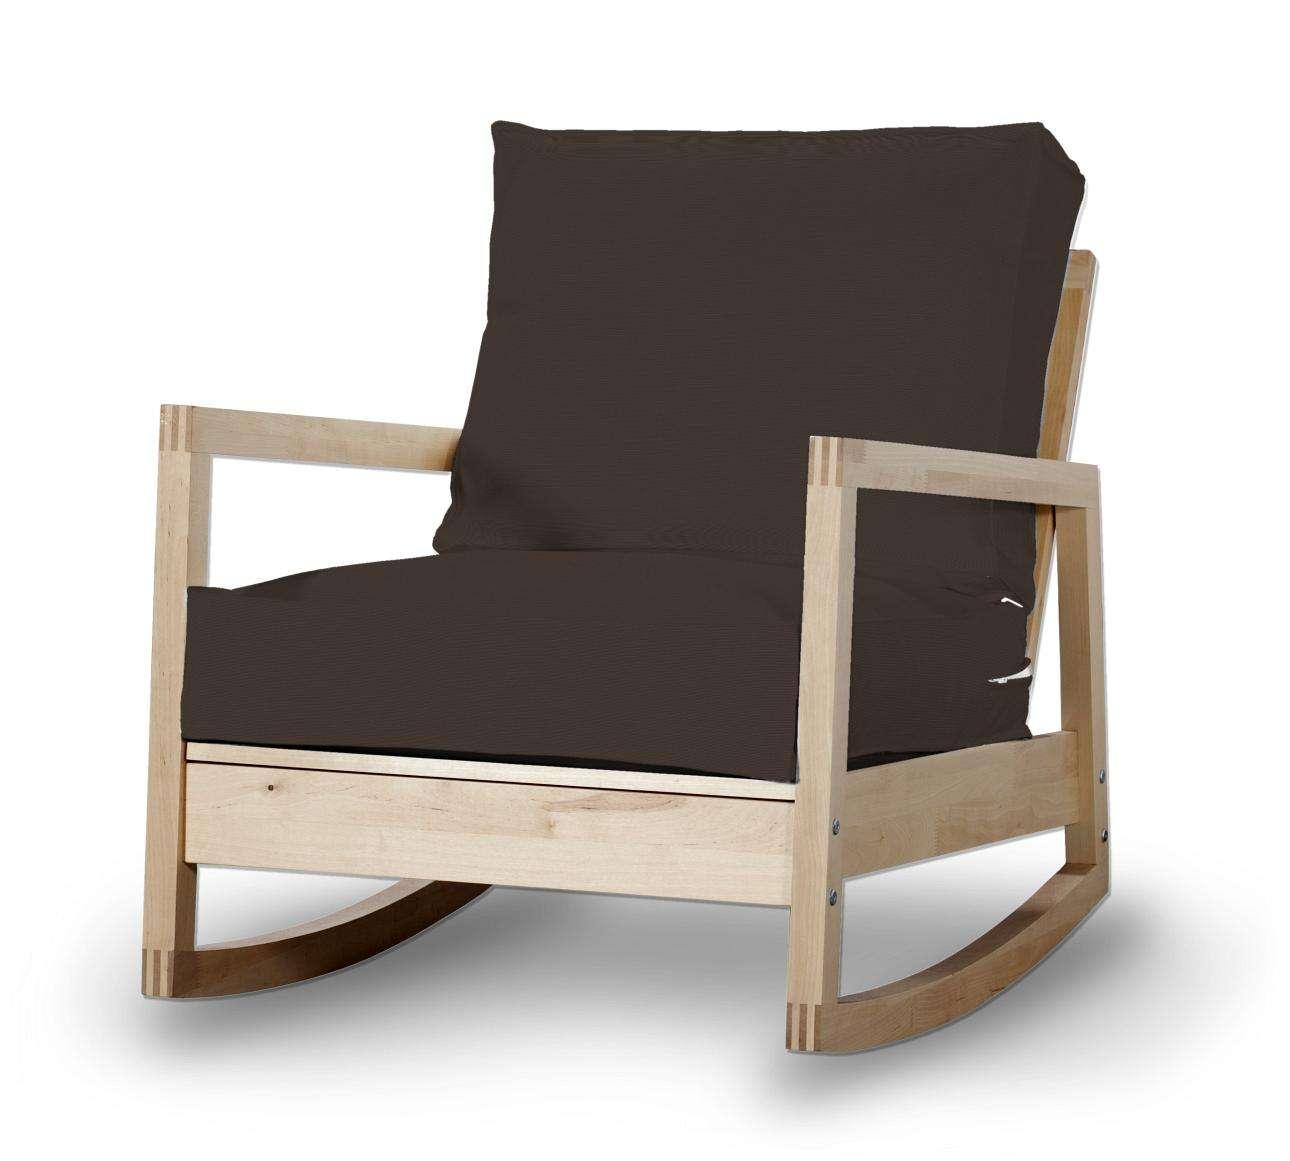 Pokrowiec na fotel Lillberg Fotel Lillberg w kolekcji Cotton Panama, tkanina: 702-03